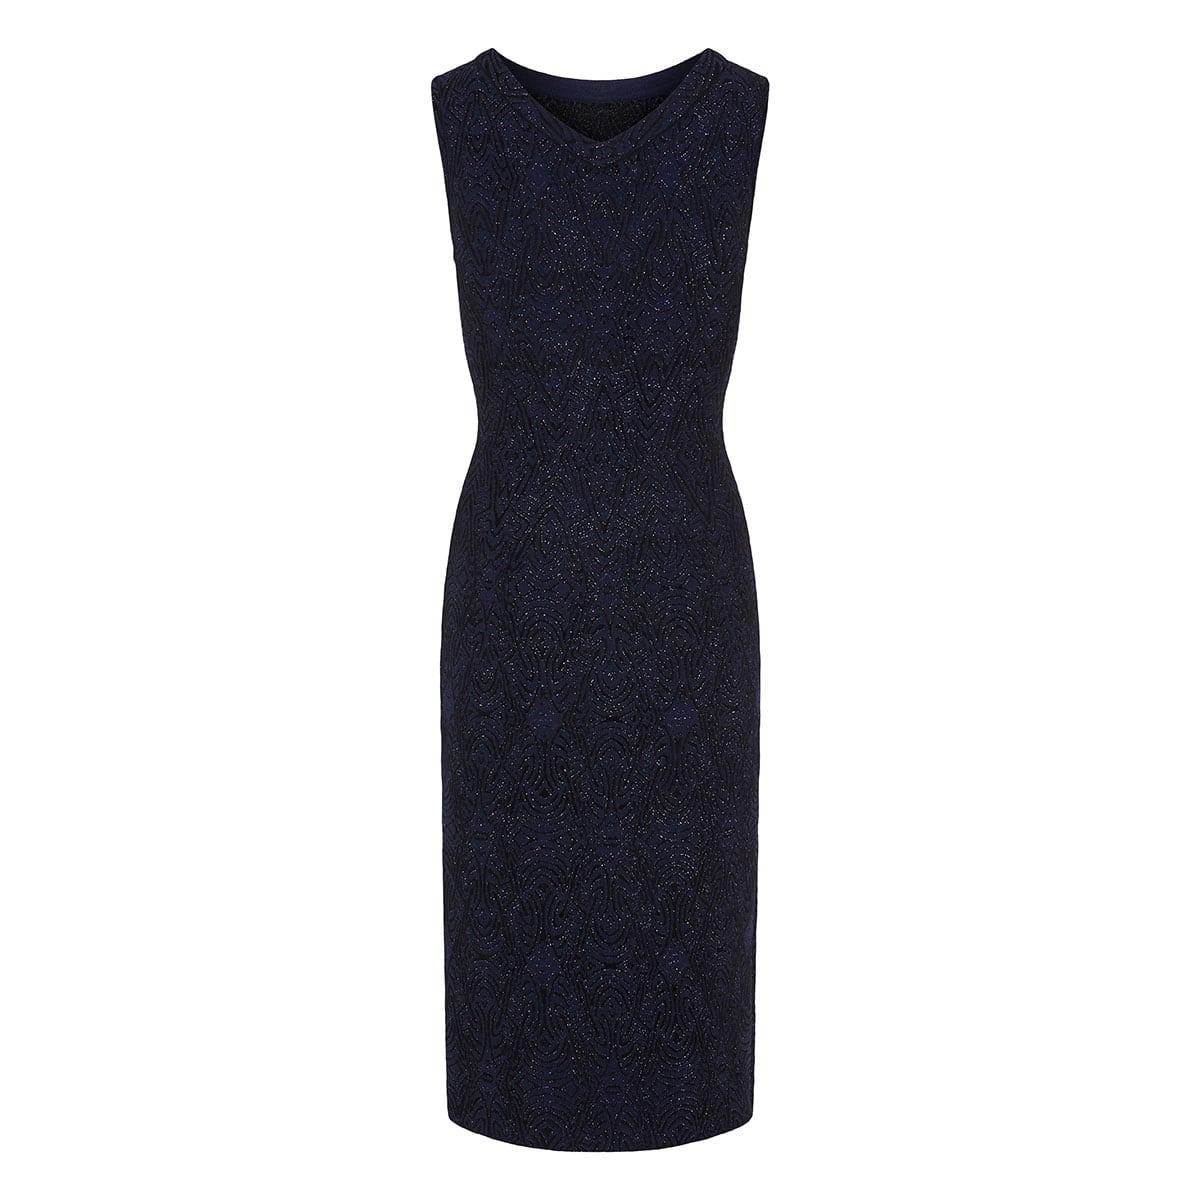 Patterned jacquard lurex midi dress